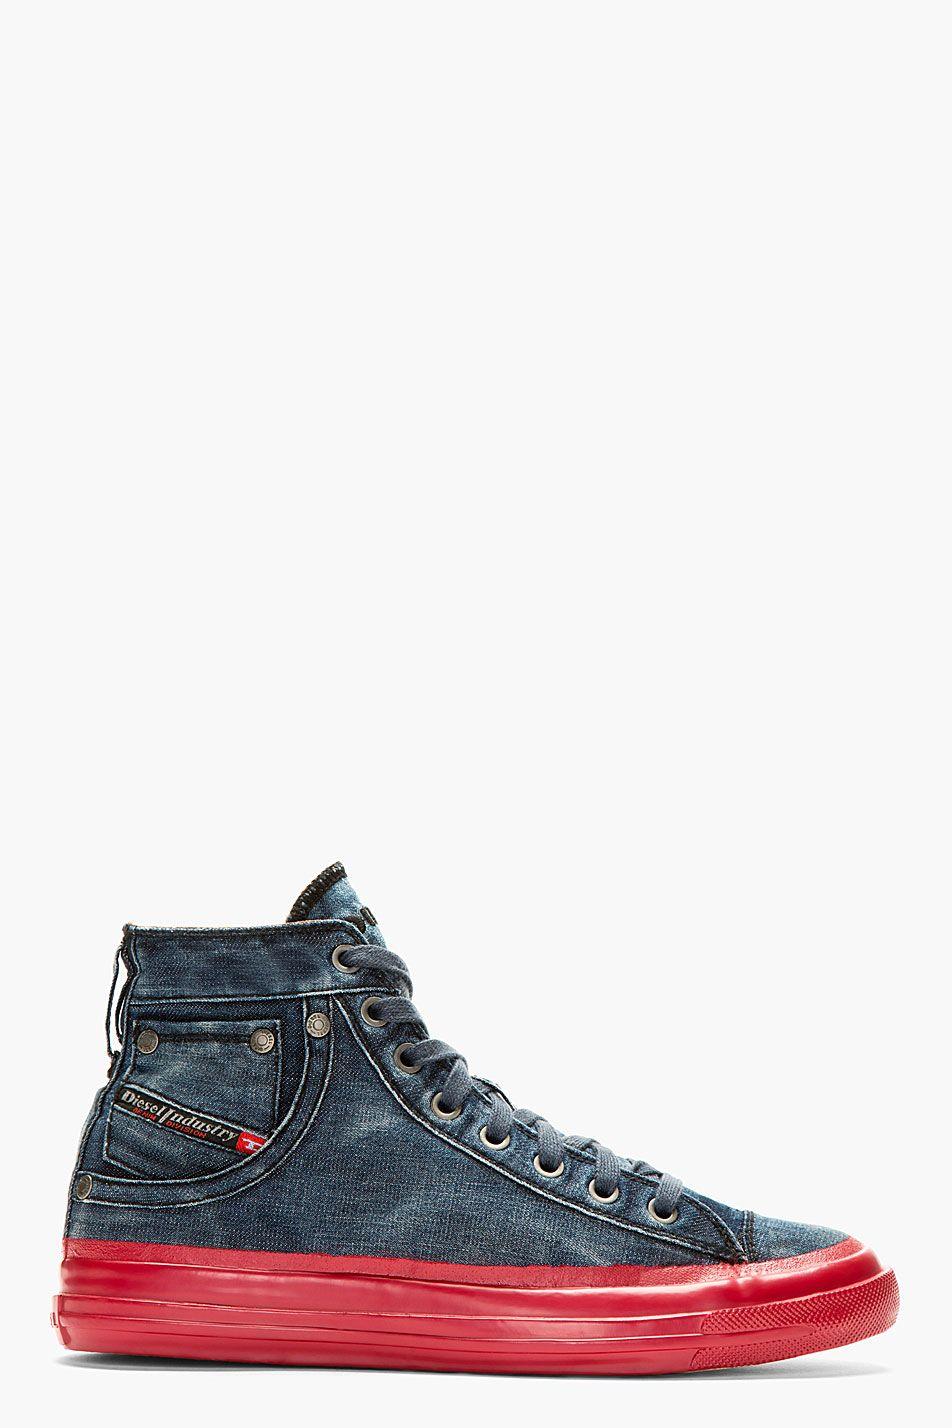 the best attitude 3ed8f edb00 DIESEL Blue Denim Contrast Sole Exposure High-Top Sneakers